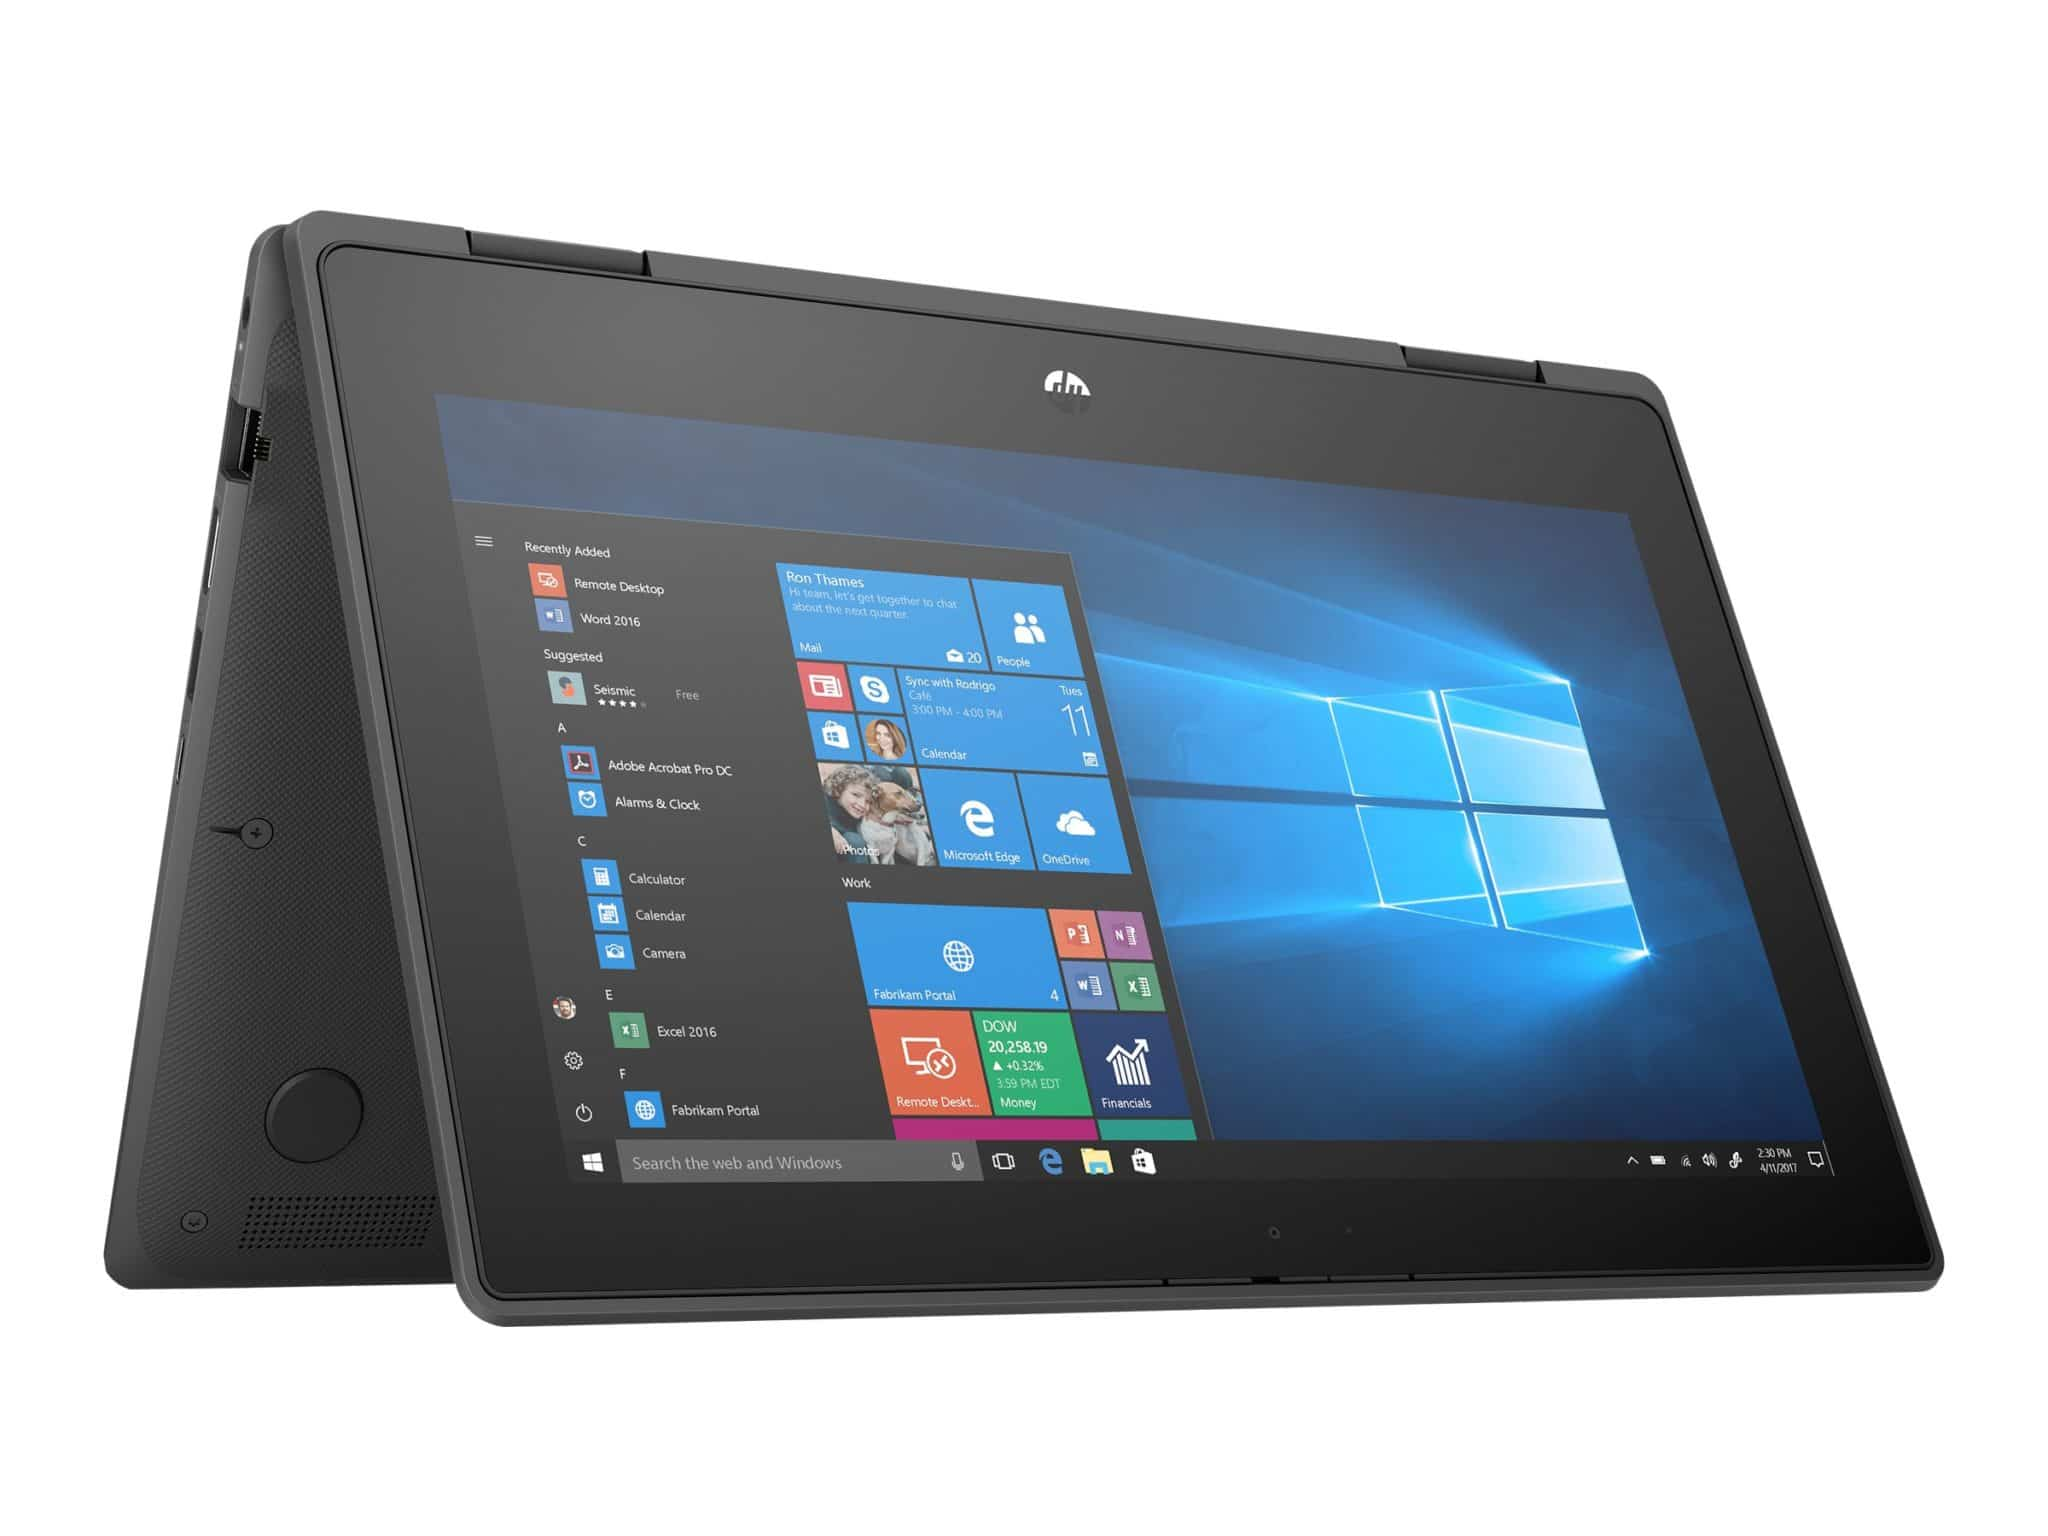 "HP ProBook x360 11 G5 - Education Edition - 11.6"" - Celeron N4020 - 4 GB RAM - Smart Buy - Notebook"